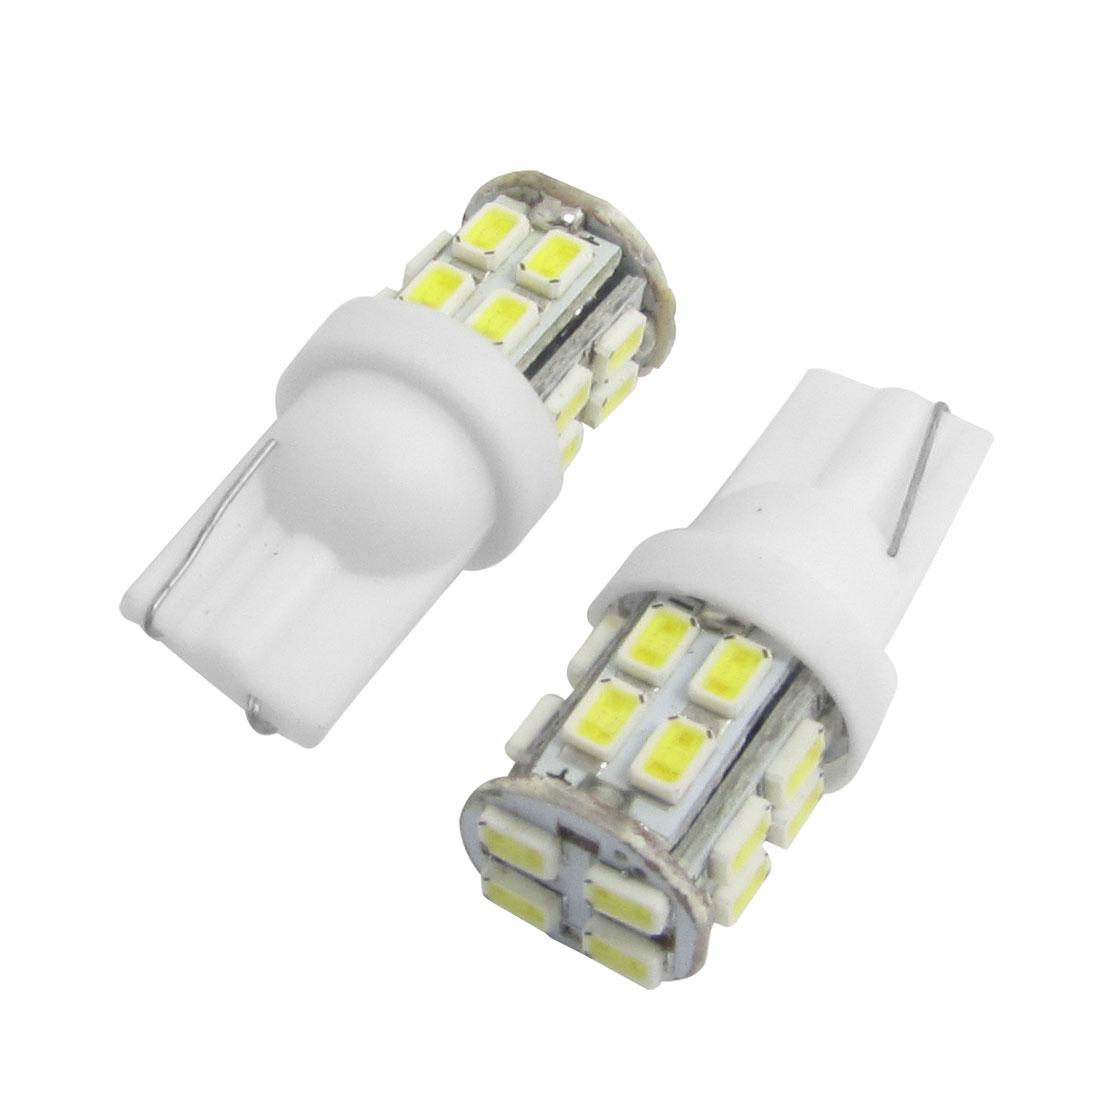 10x White 3020 1206 SMD 20 LED T10 W5W 194 168 192 Car Signal Side Light Bulbs